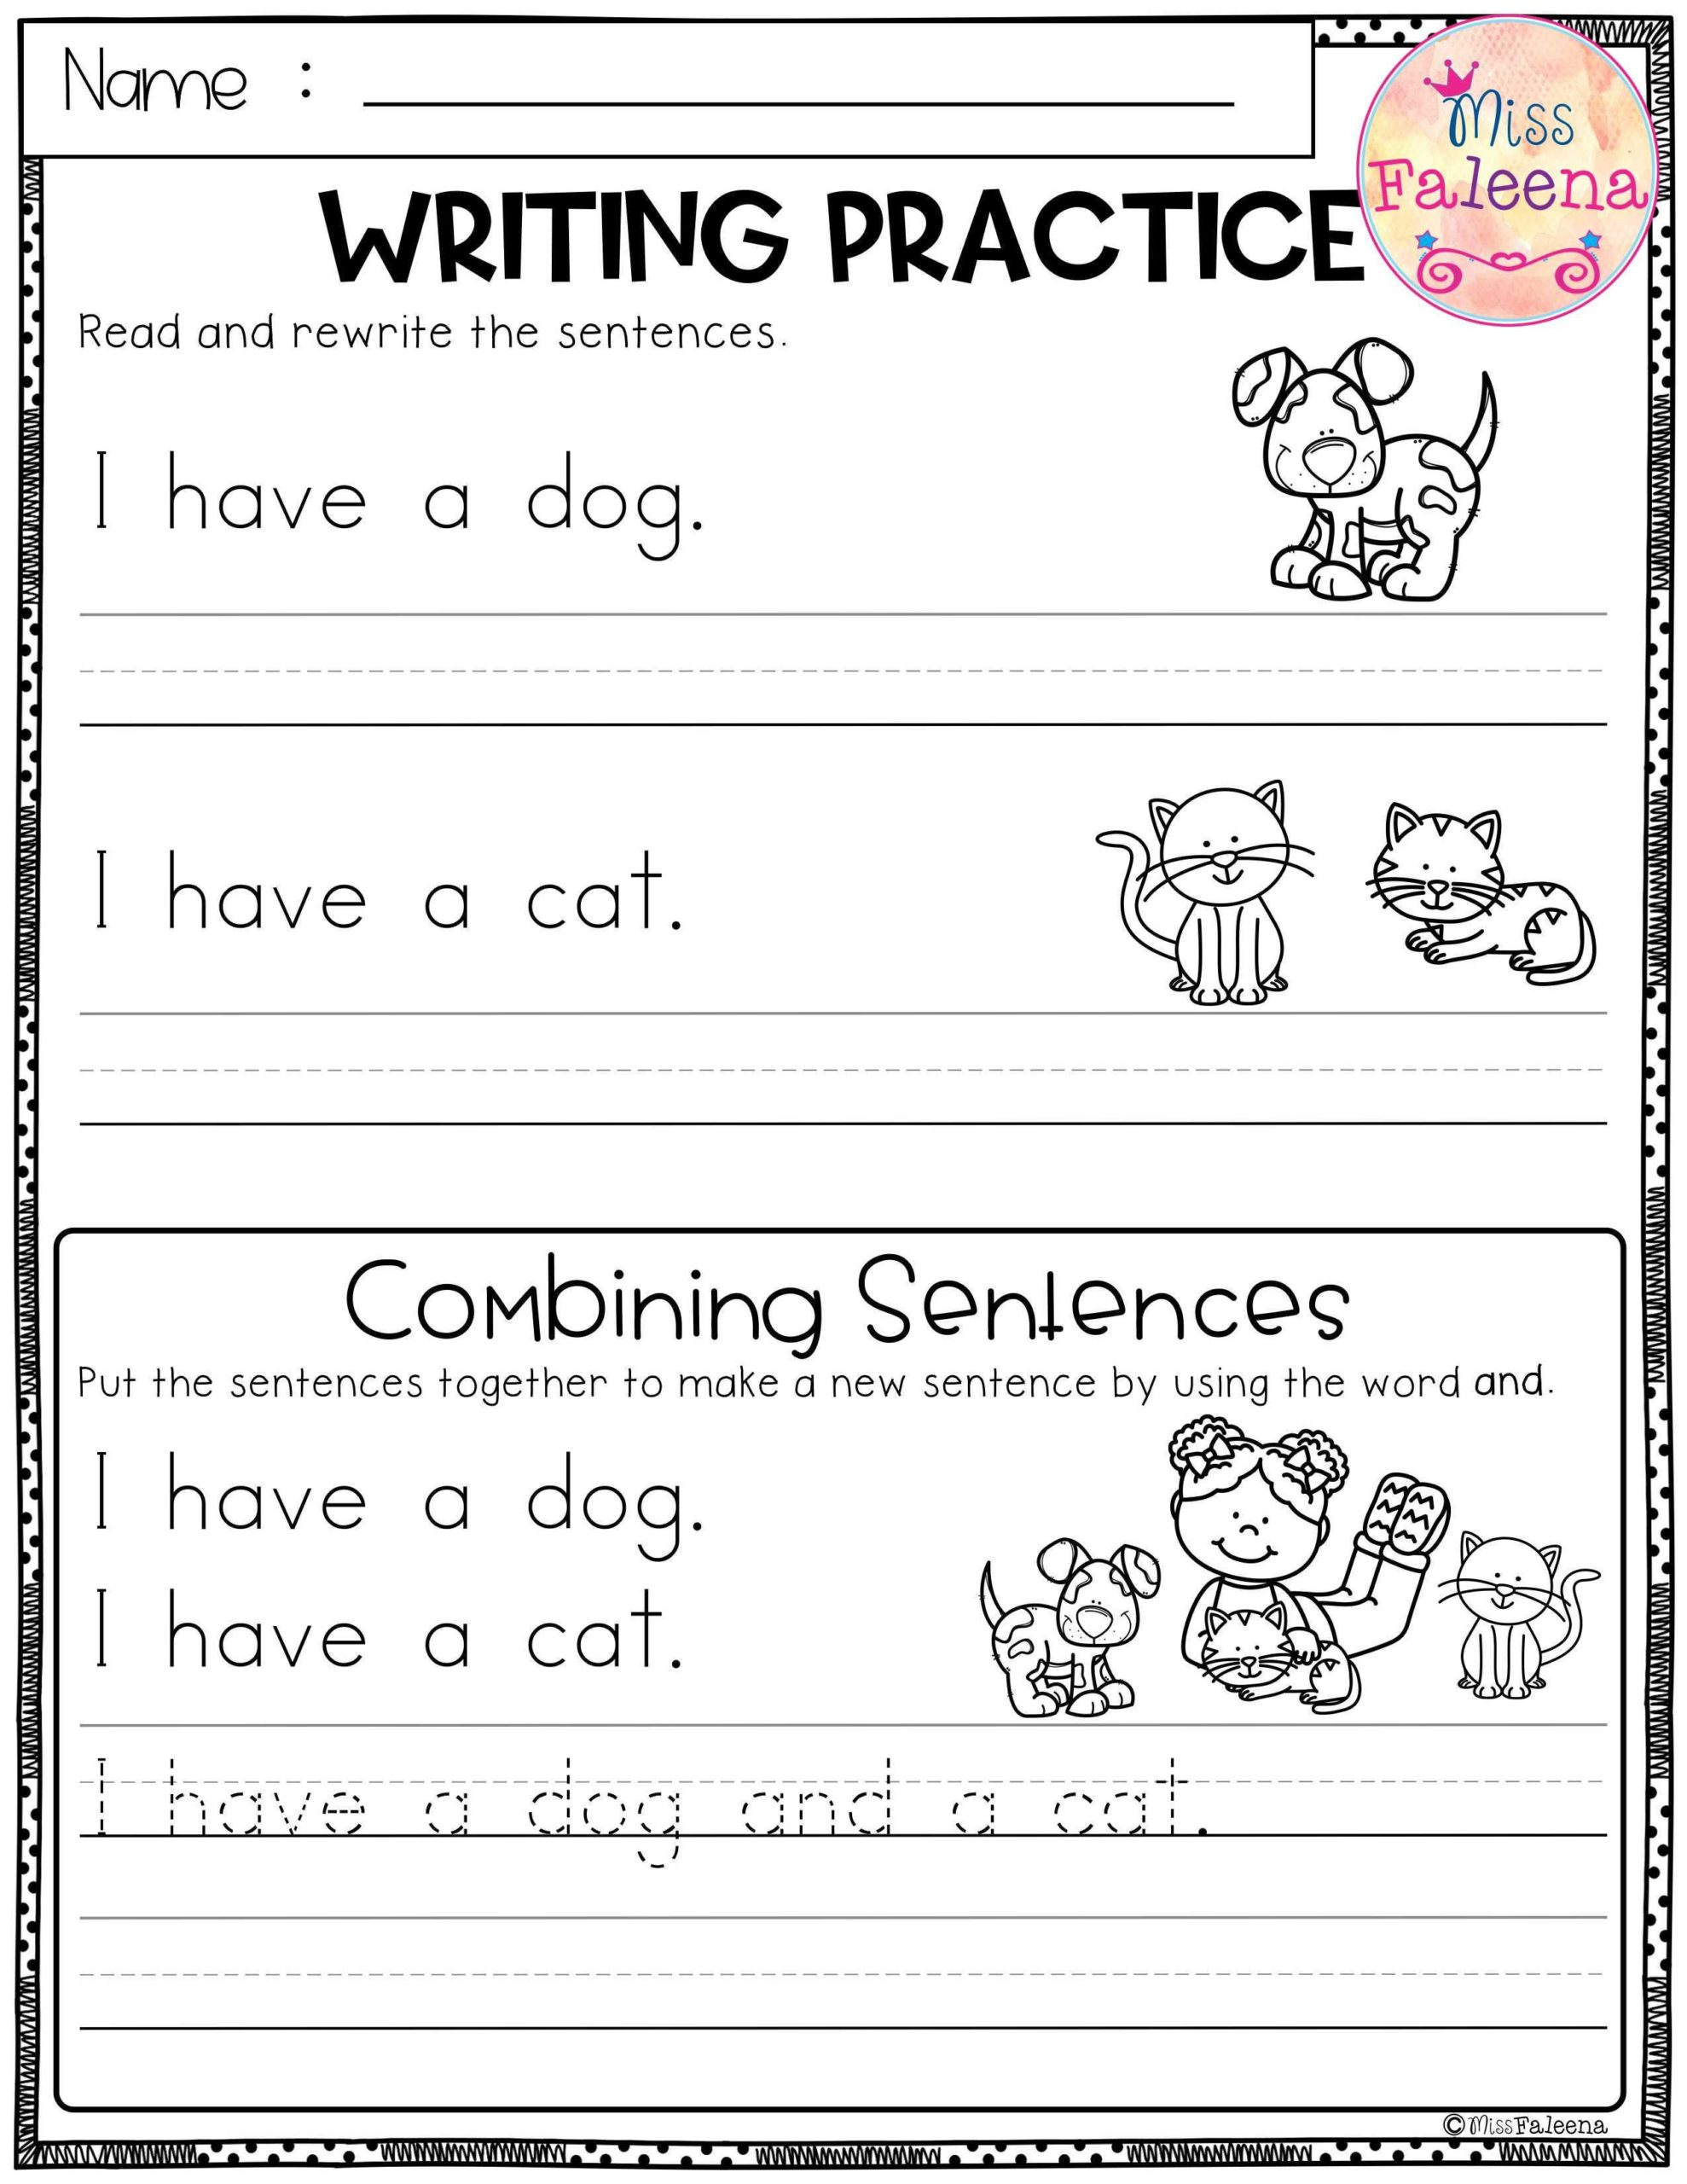 Free Writing Practice Combining Sentences Sentence